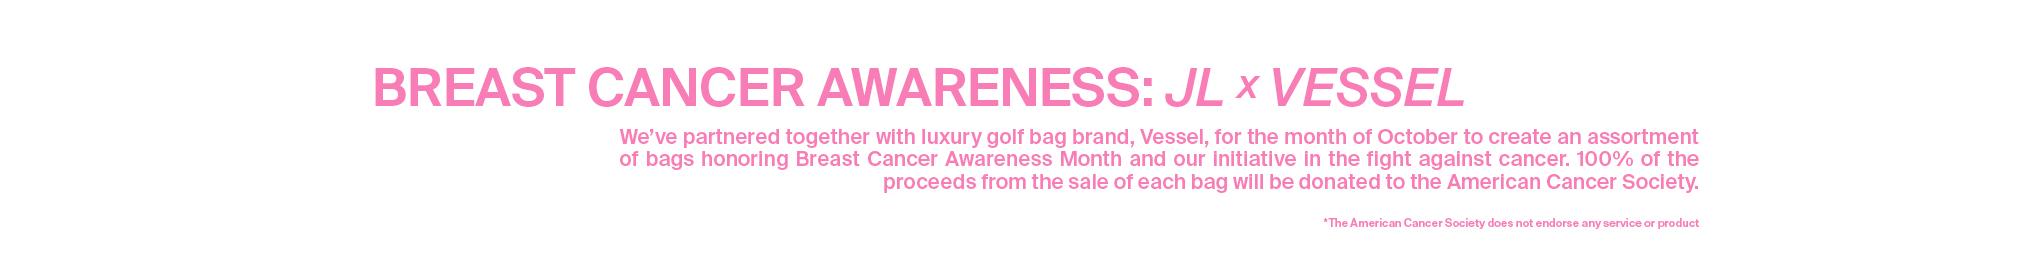 Breast Cancer Awareness: JL x Vessel